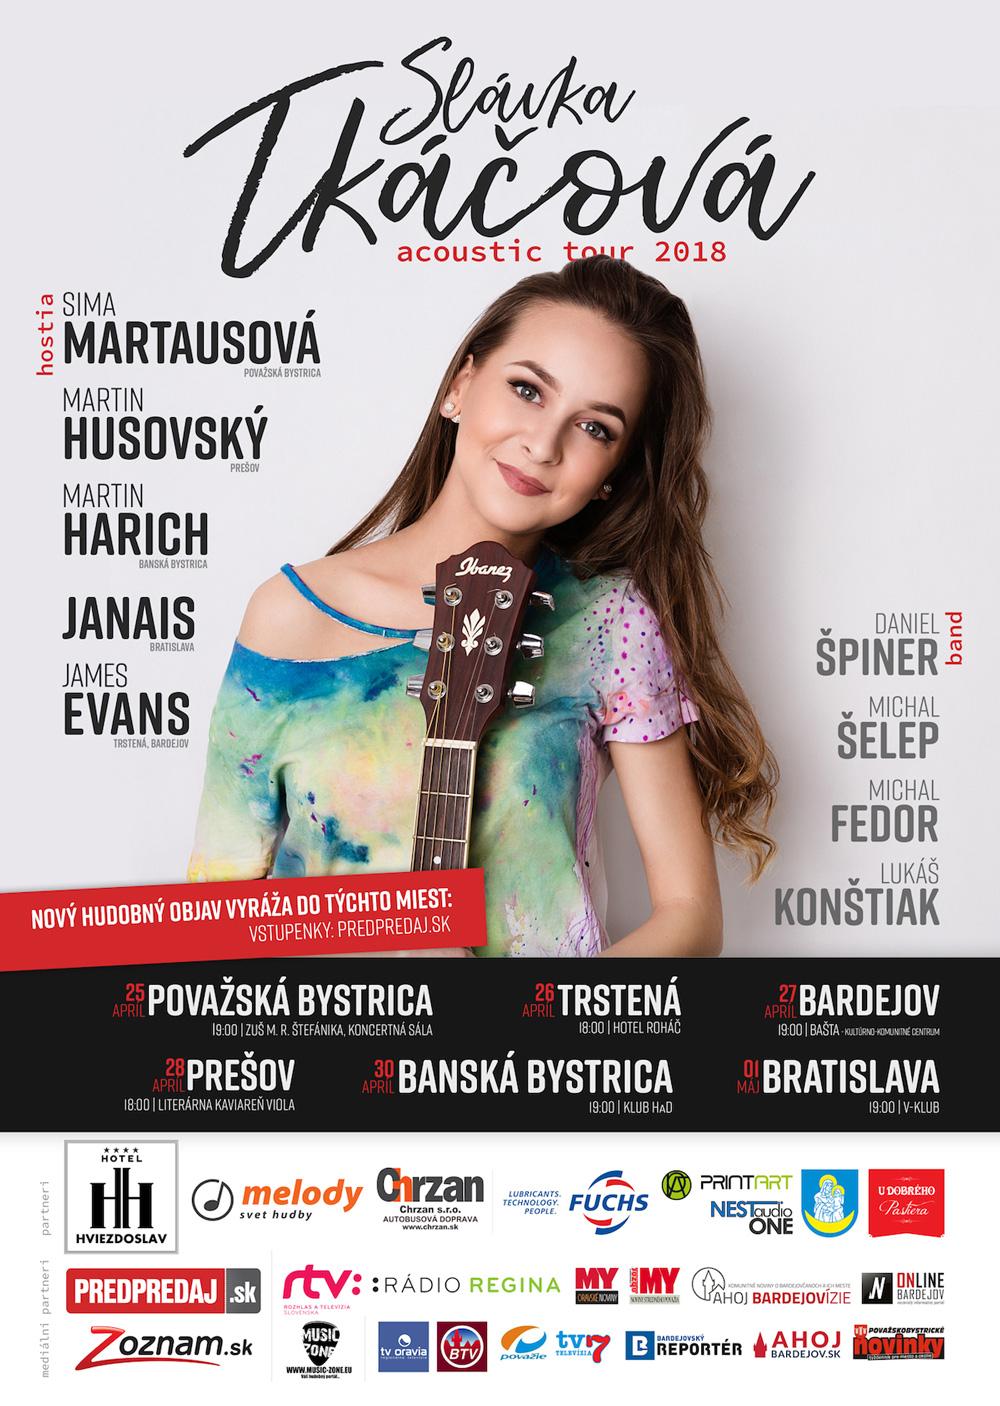 Hudobný objav Slávka Tkáčová vyráža s podporou známych tvárí na akustické turné, neobíde ani Bardejov.